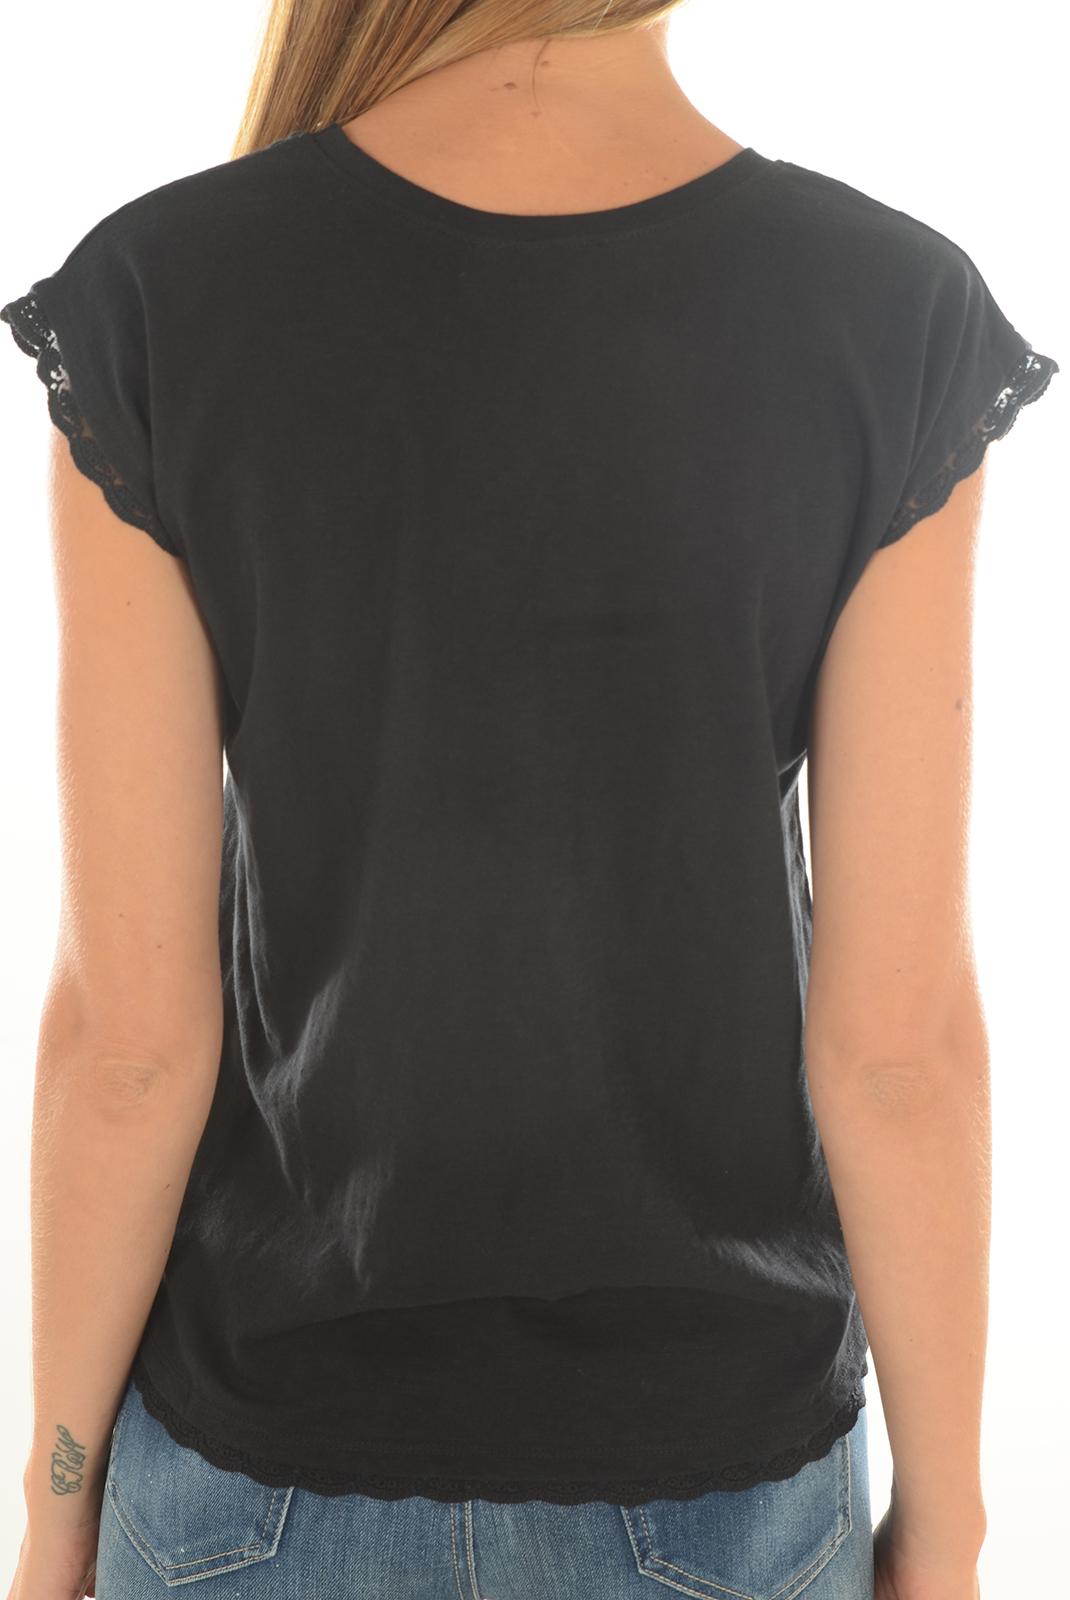 Tee shirt  Kaporal FEAR BLACK